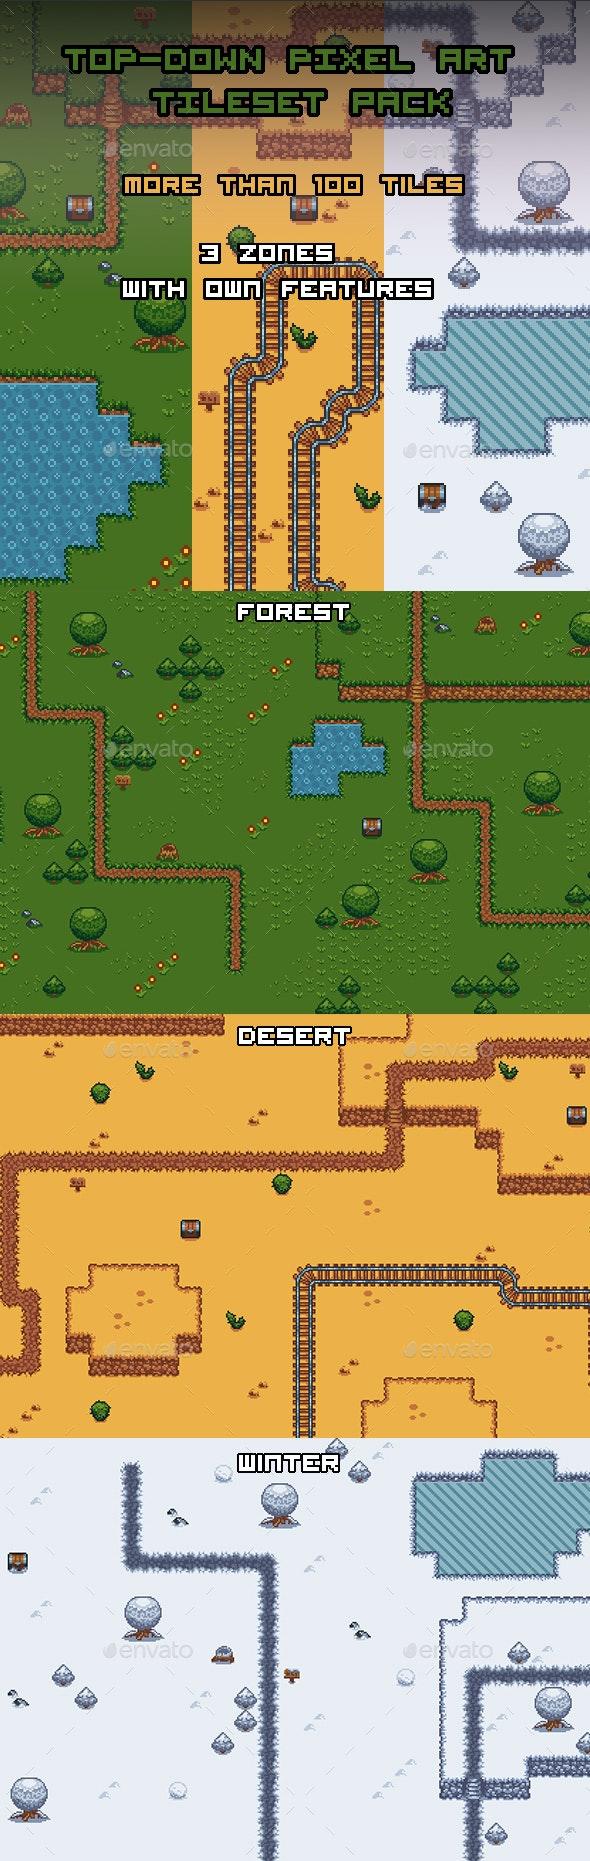 Top-Down Pixel Art Tileset pack for 2D Game - Tilesets Game Assets